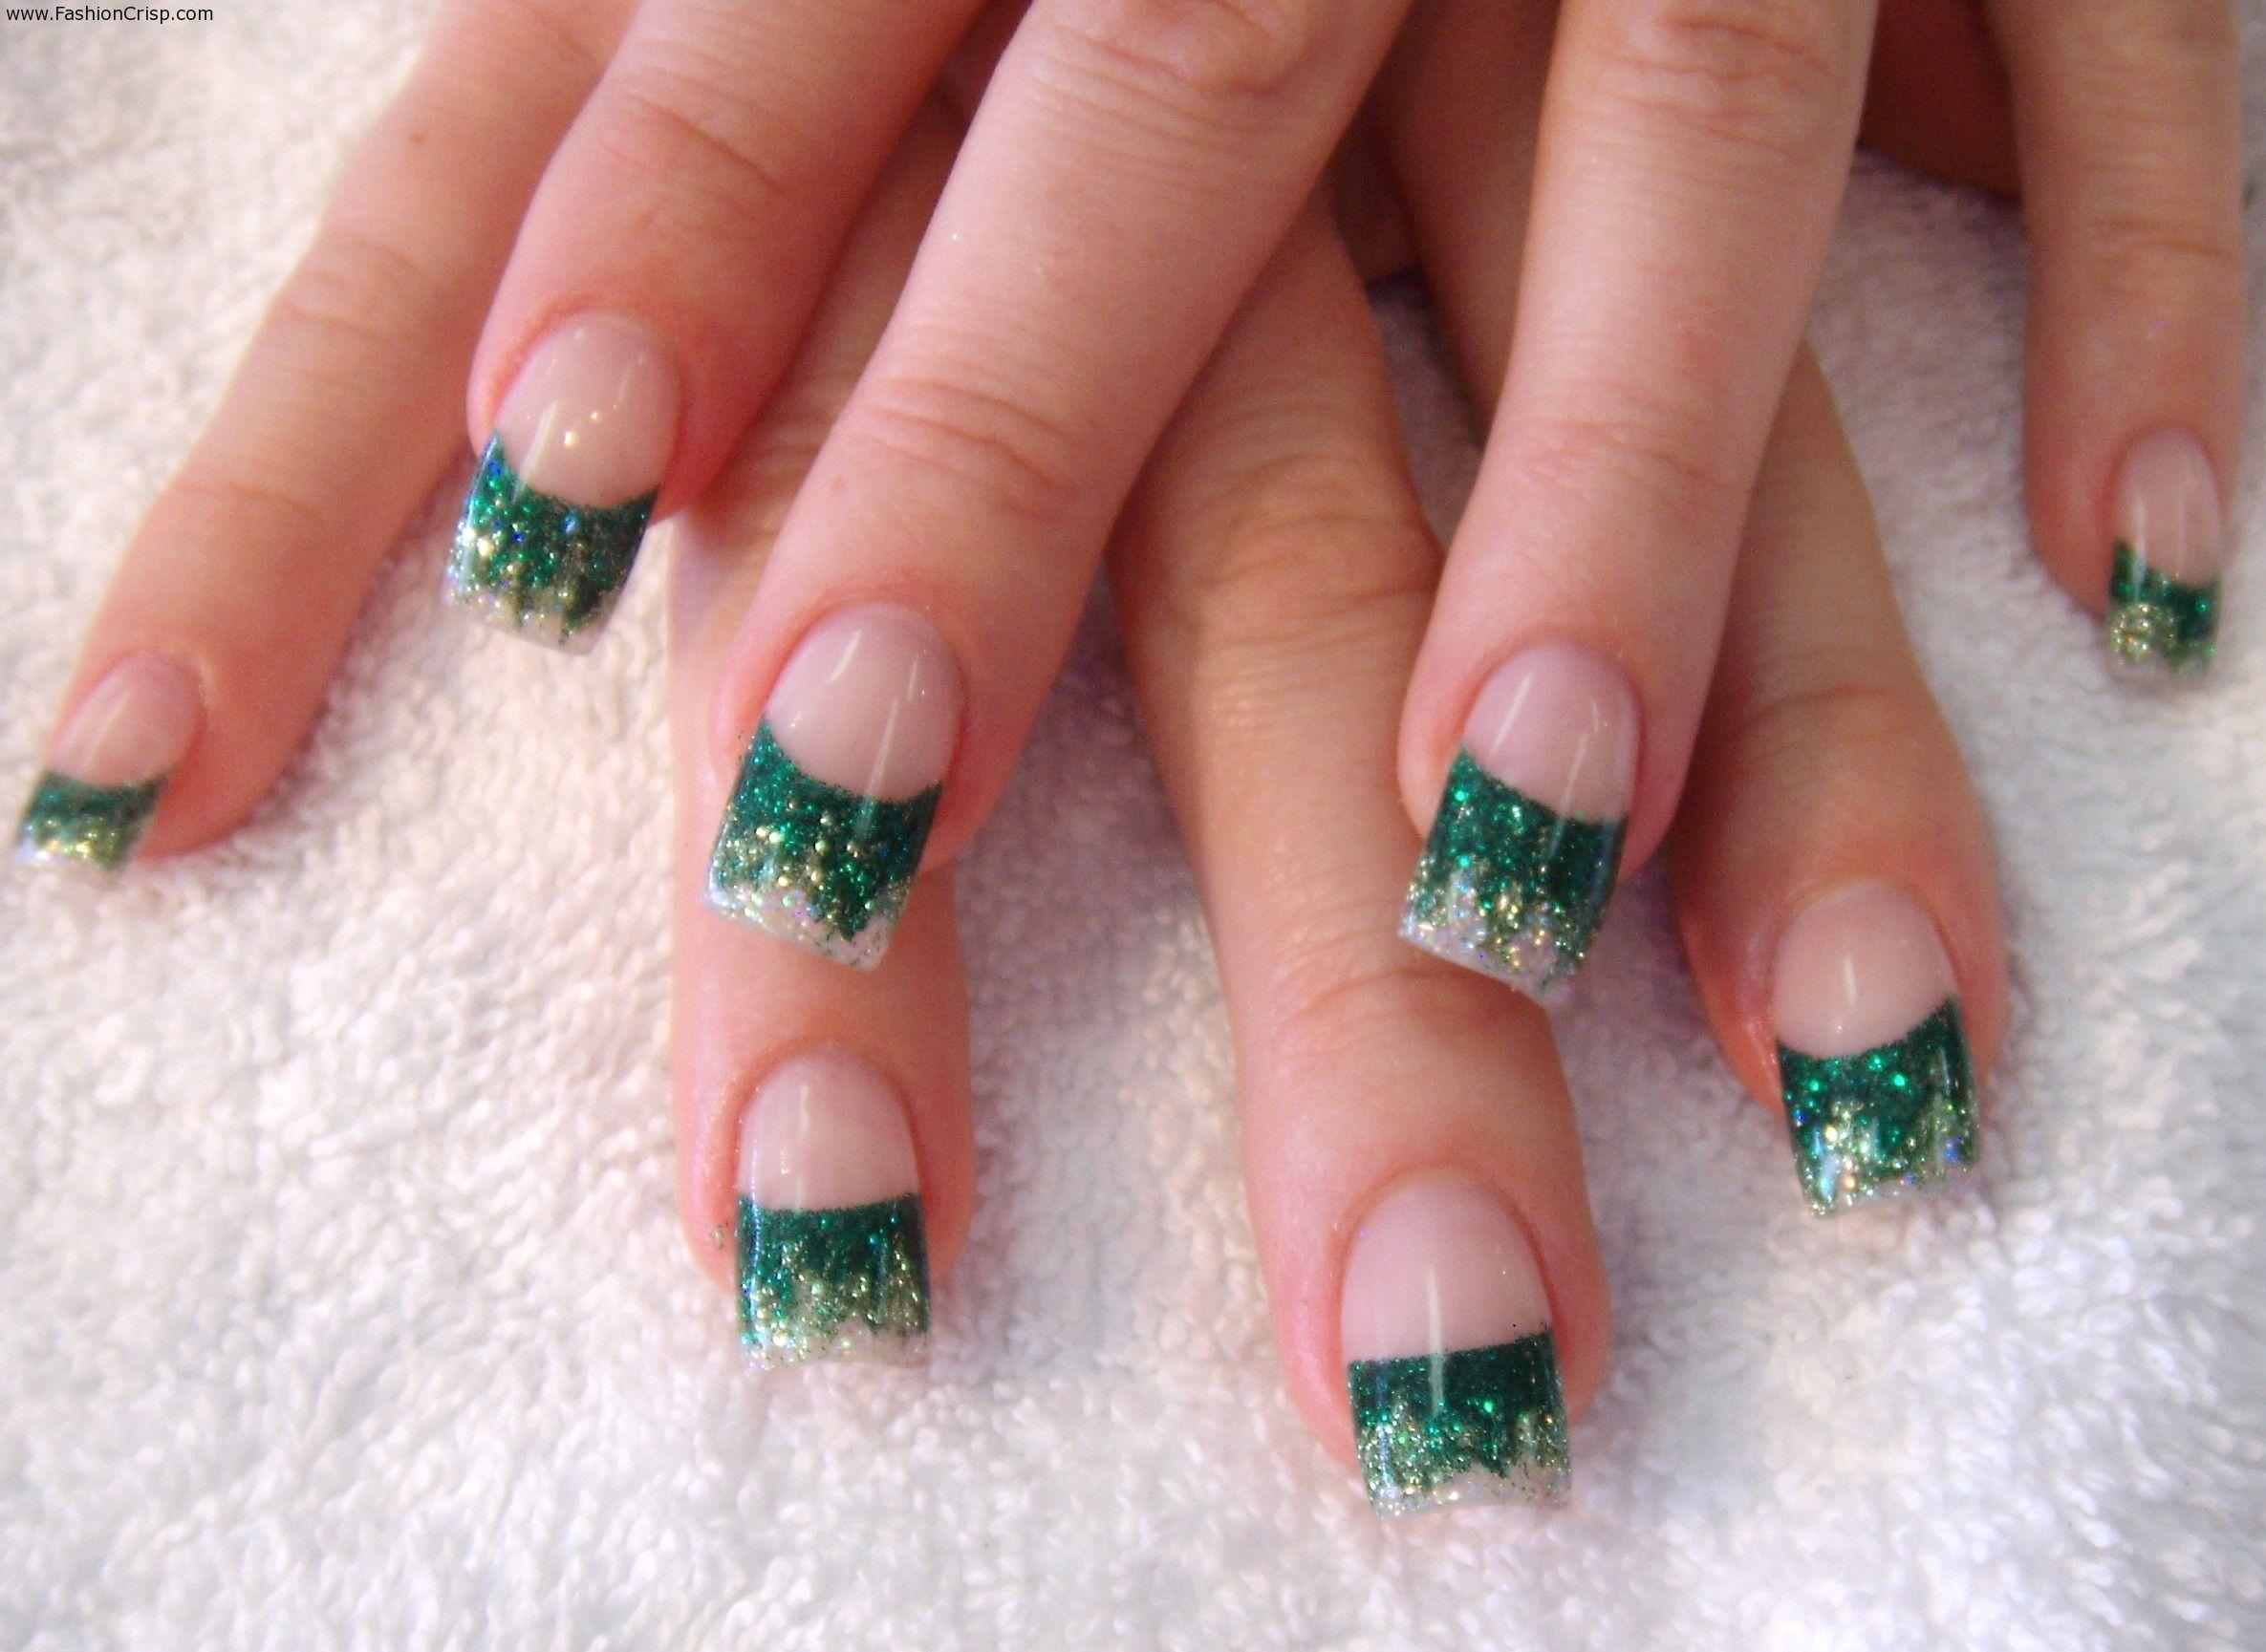 new nail art designs latest bridal nail art ideas 11 fashioncrisp ...